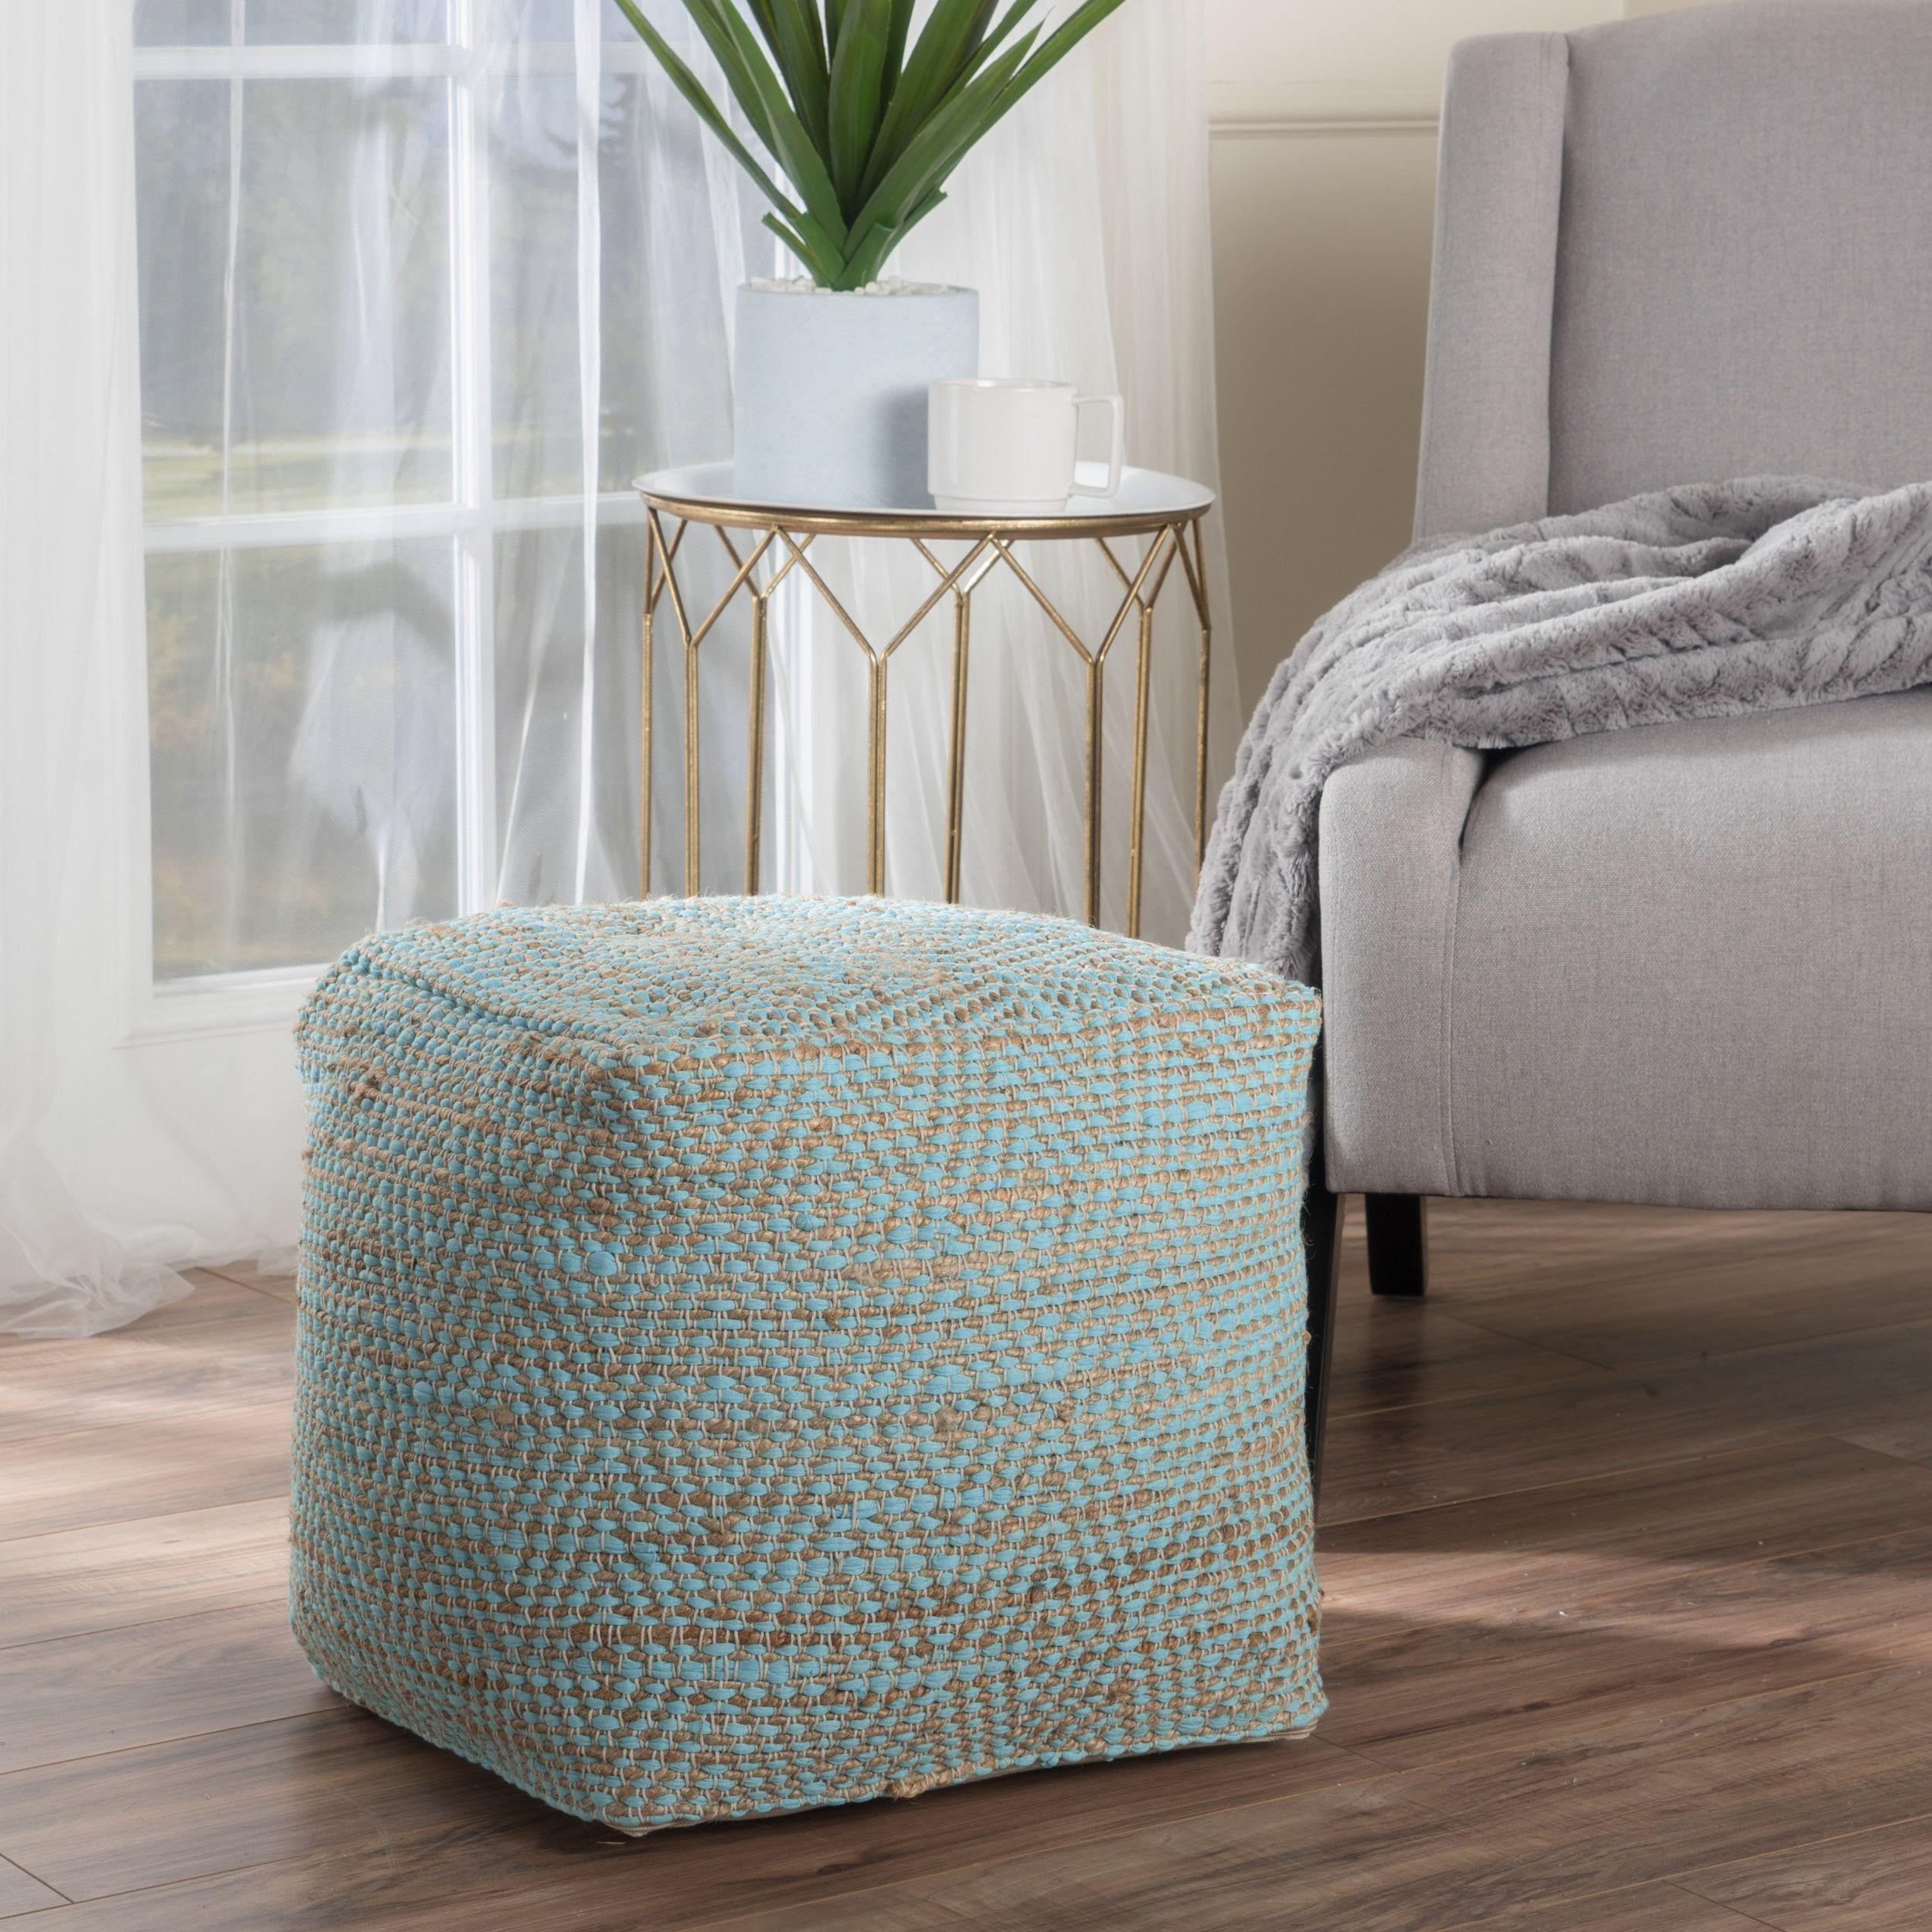 Brilliant Federalsburg Pouf Diys To Try Aqua Fabric Pouf Ottoman Short Links Chair Design For Home Short Linksinfo